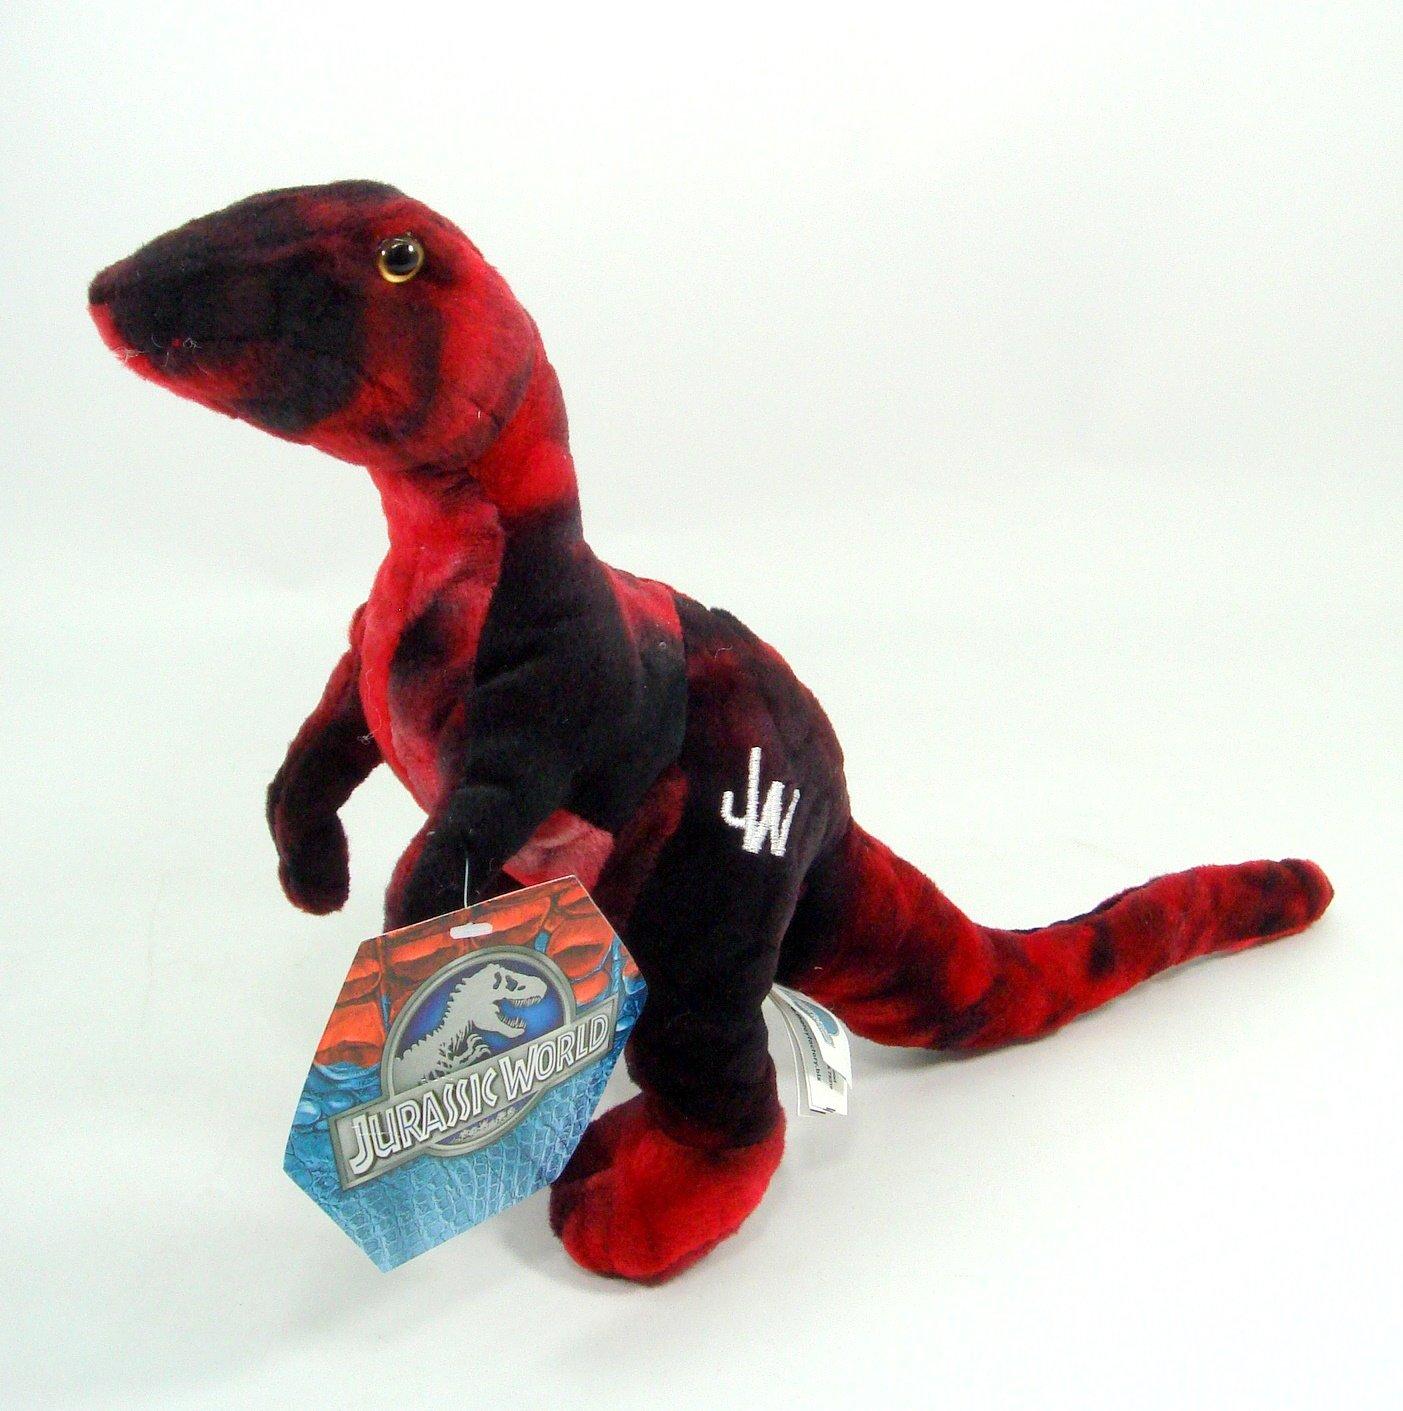 Jurassic world toys on Shoppinder